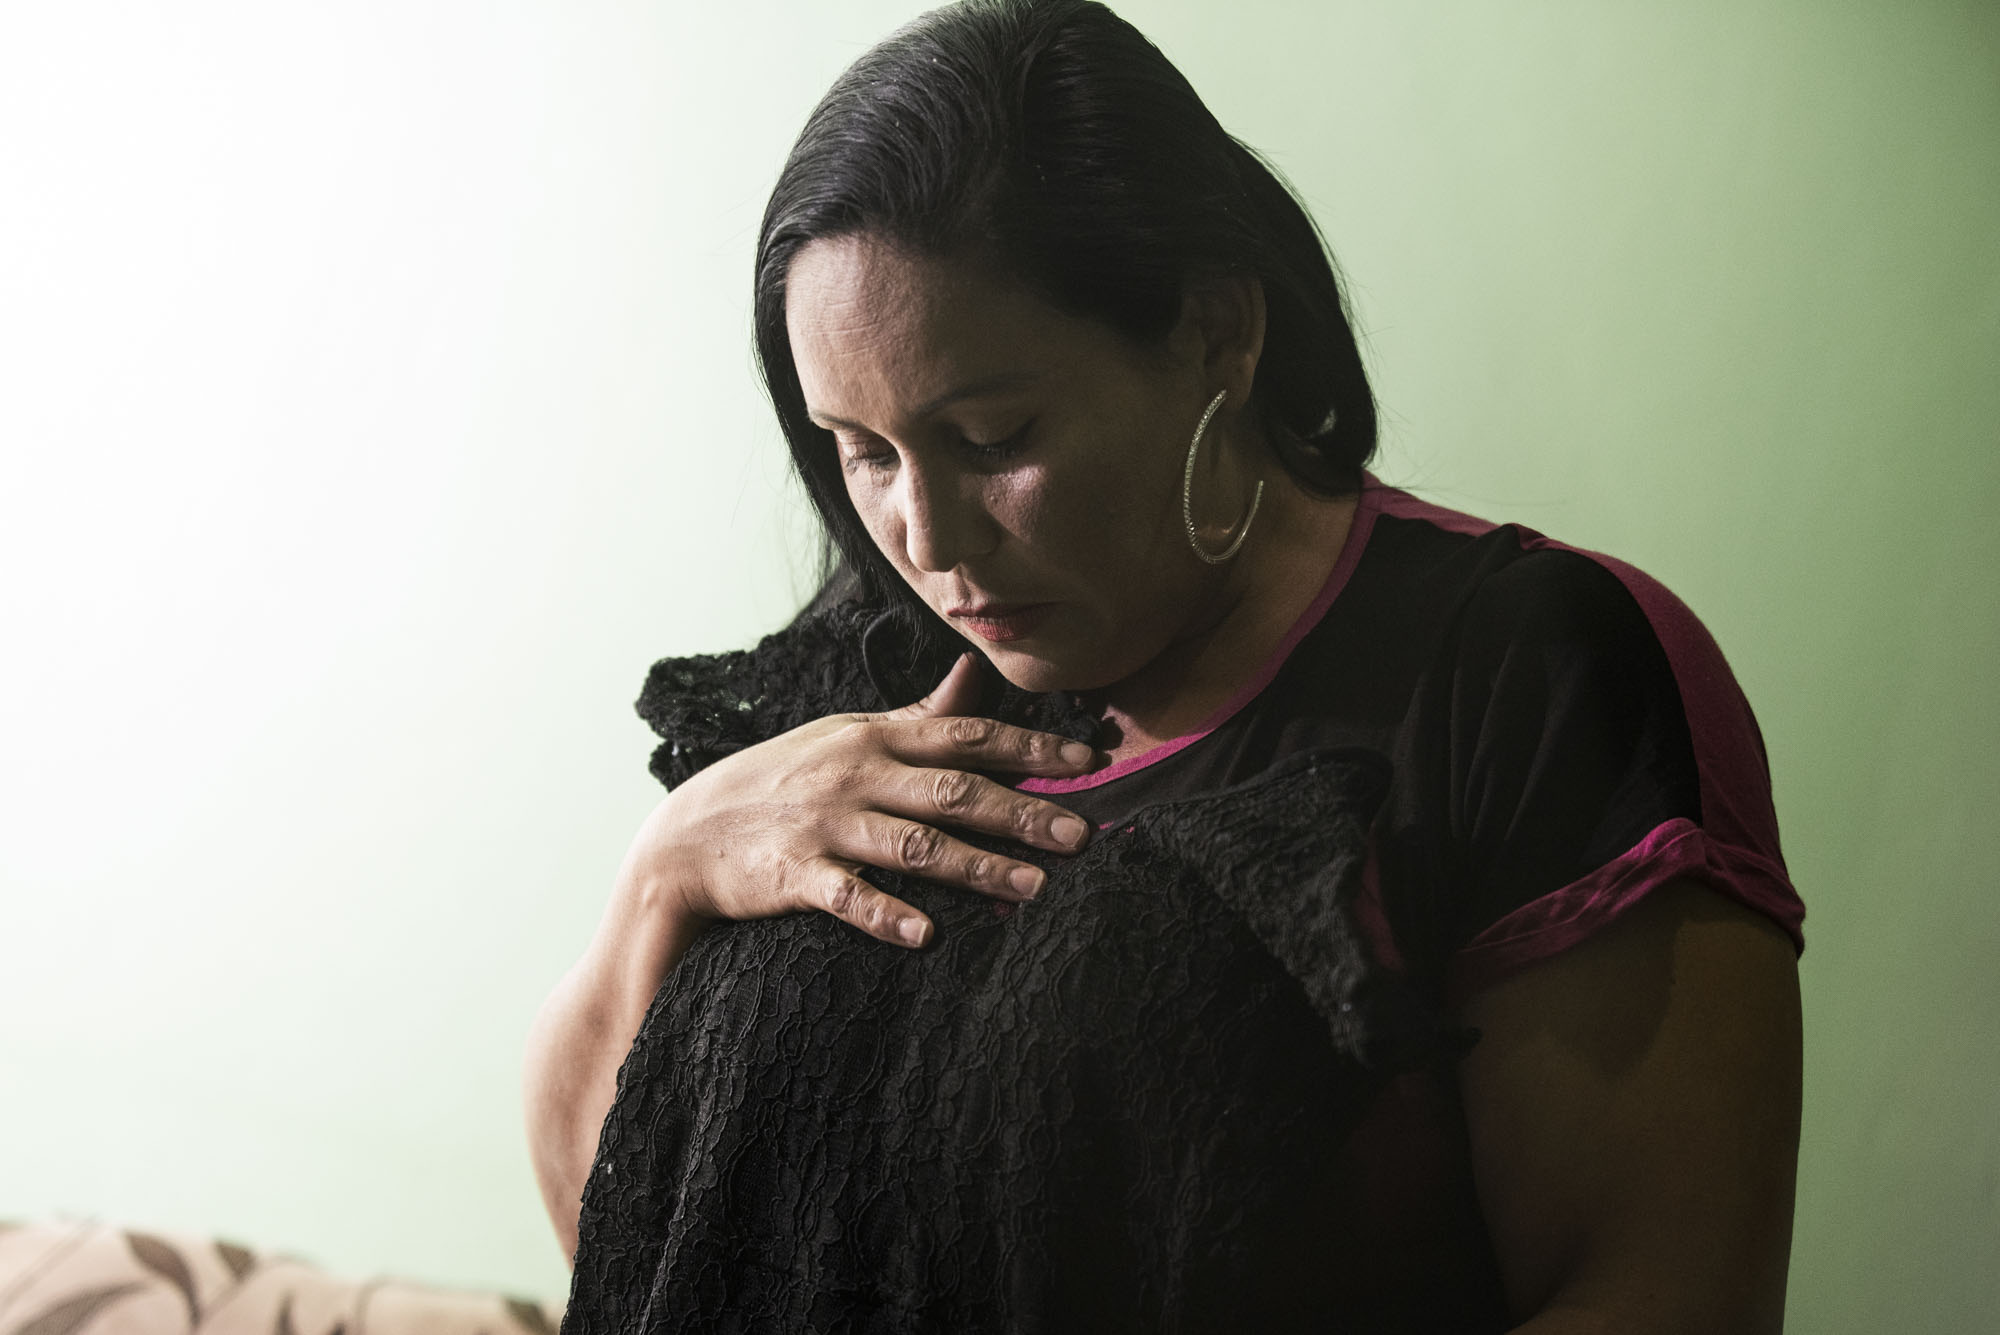 Só Tatiane dos Santos era autorizada por Maciel a cortar o cabelo de Jacqueline